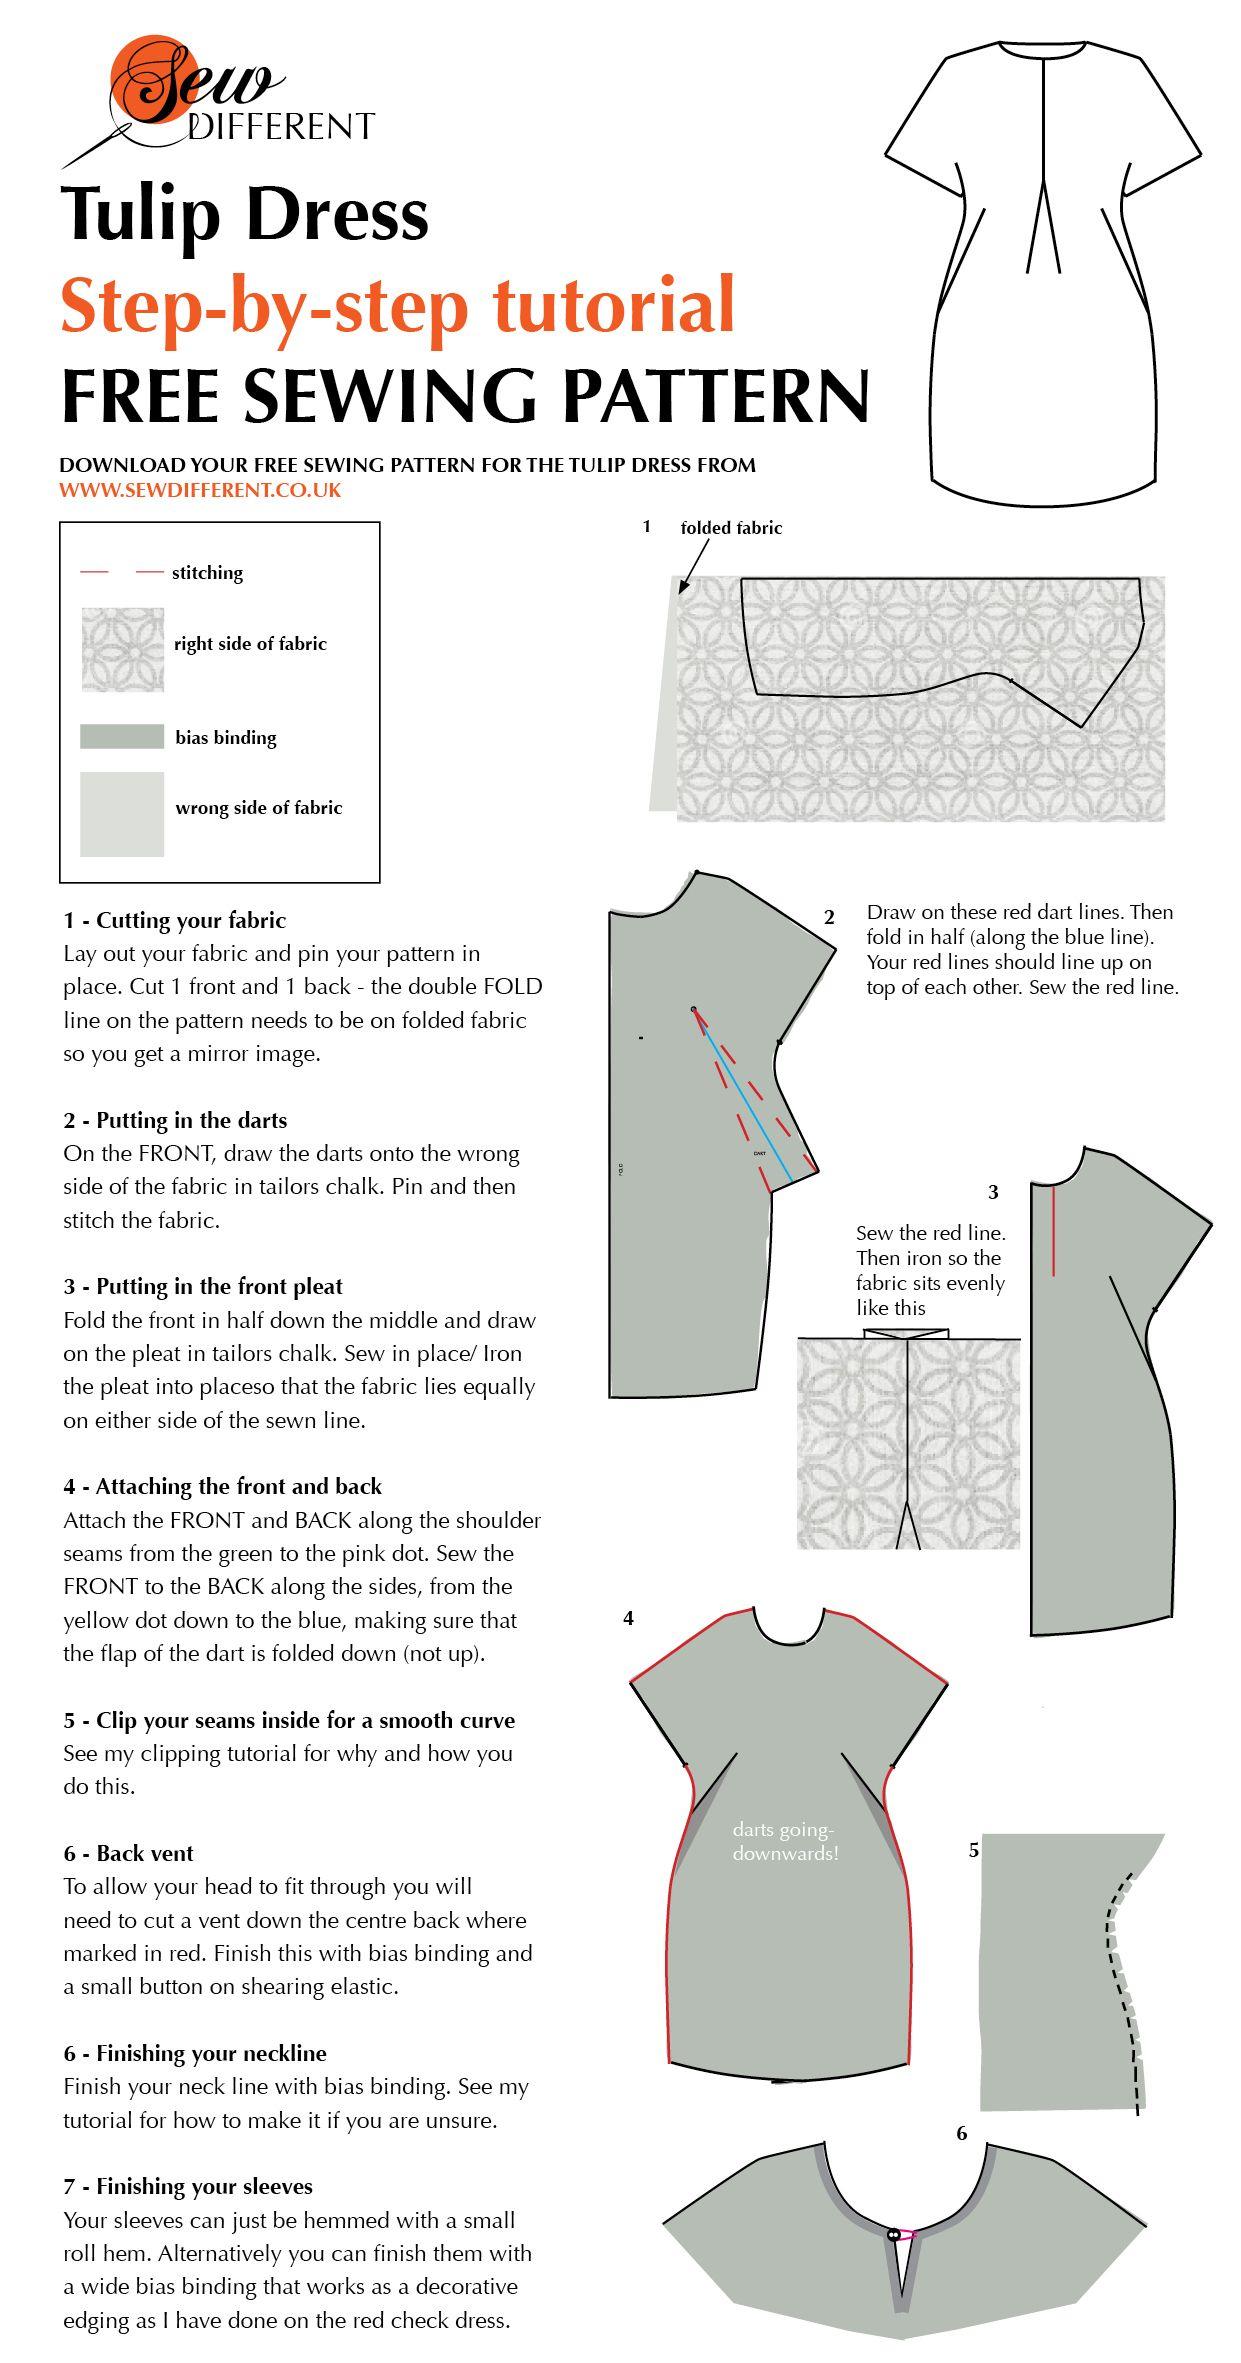 Tulip Dress - Free sewing pattern LC010 | Nähen, Schnittmuster und ...